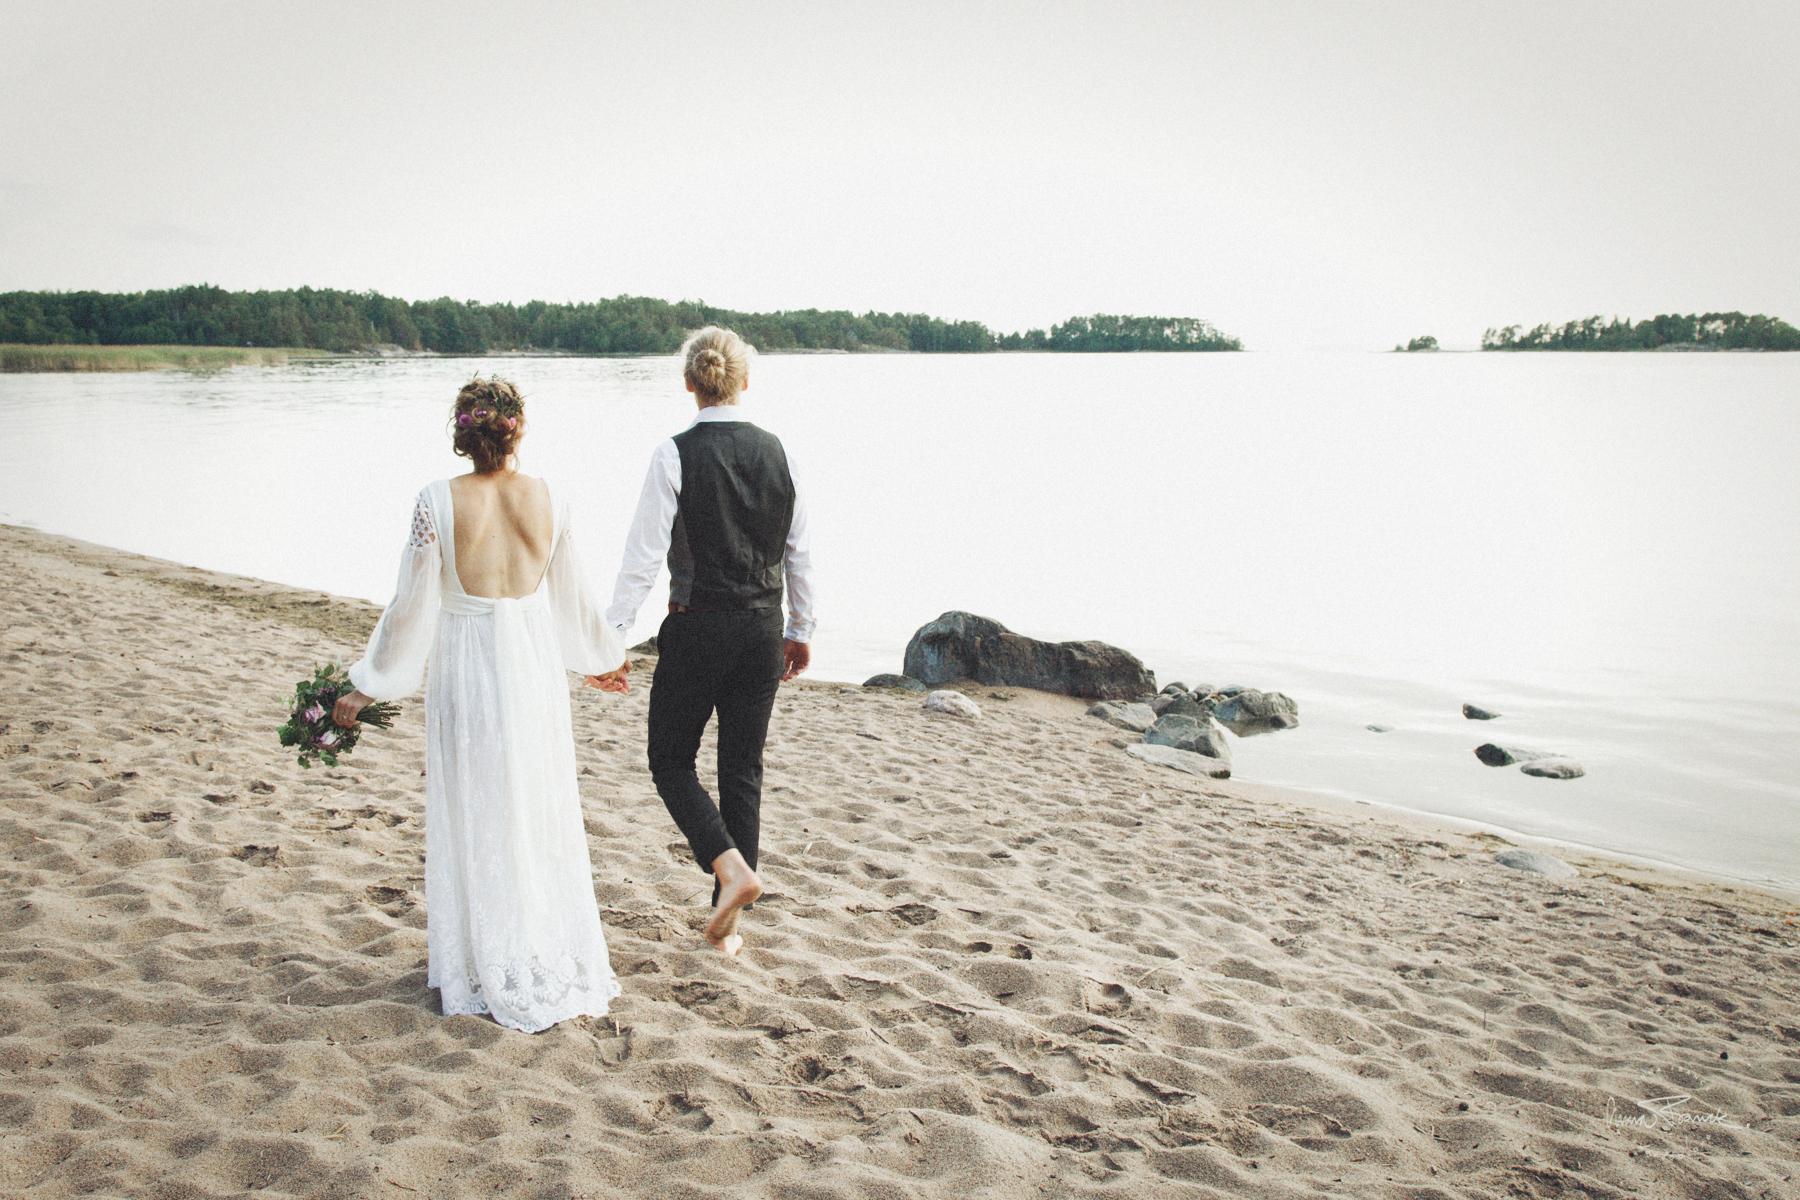 wedding, bröllop, häät, Parainen, Pargas, Finland, Suomi, summer, kesä, sommar, bohemian, natural, naturligt, vackert, avslappnat, relaxed, Finnish, nature, beach, forest, sunset, strand, ranta, design, dress, hääpuku, bröllopsklänning, bukett, kukat, flowers, porträtt, muotokuva, portraits